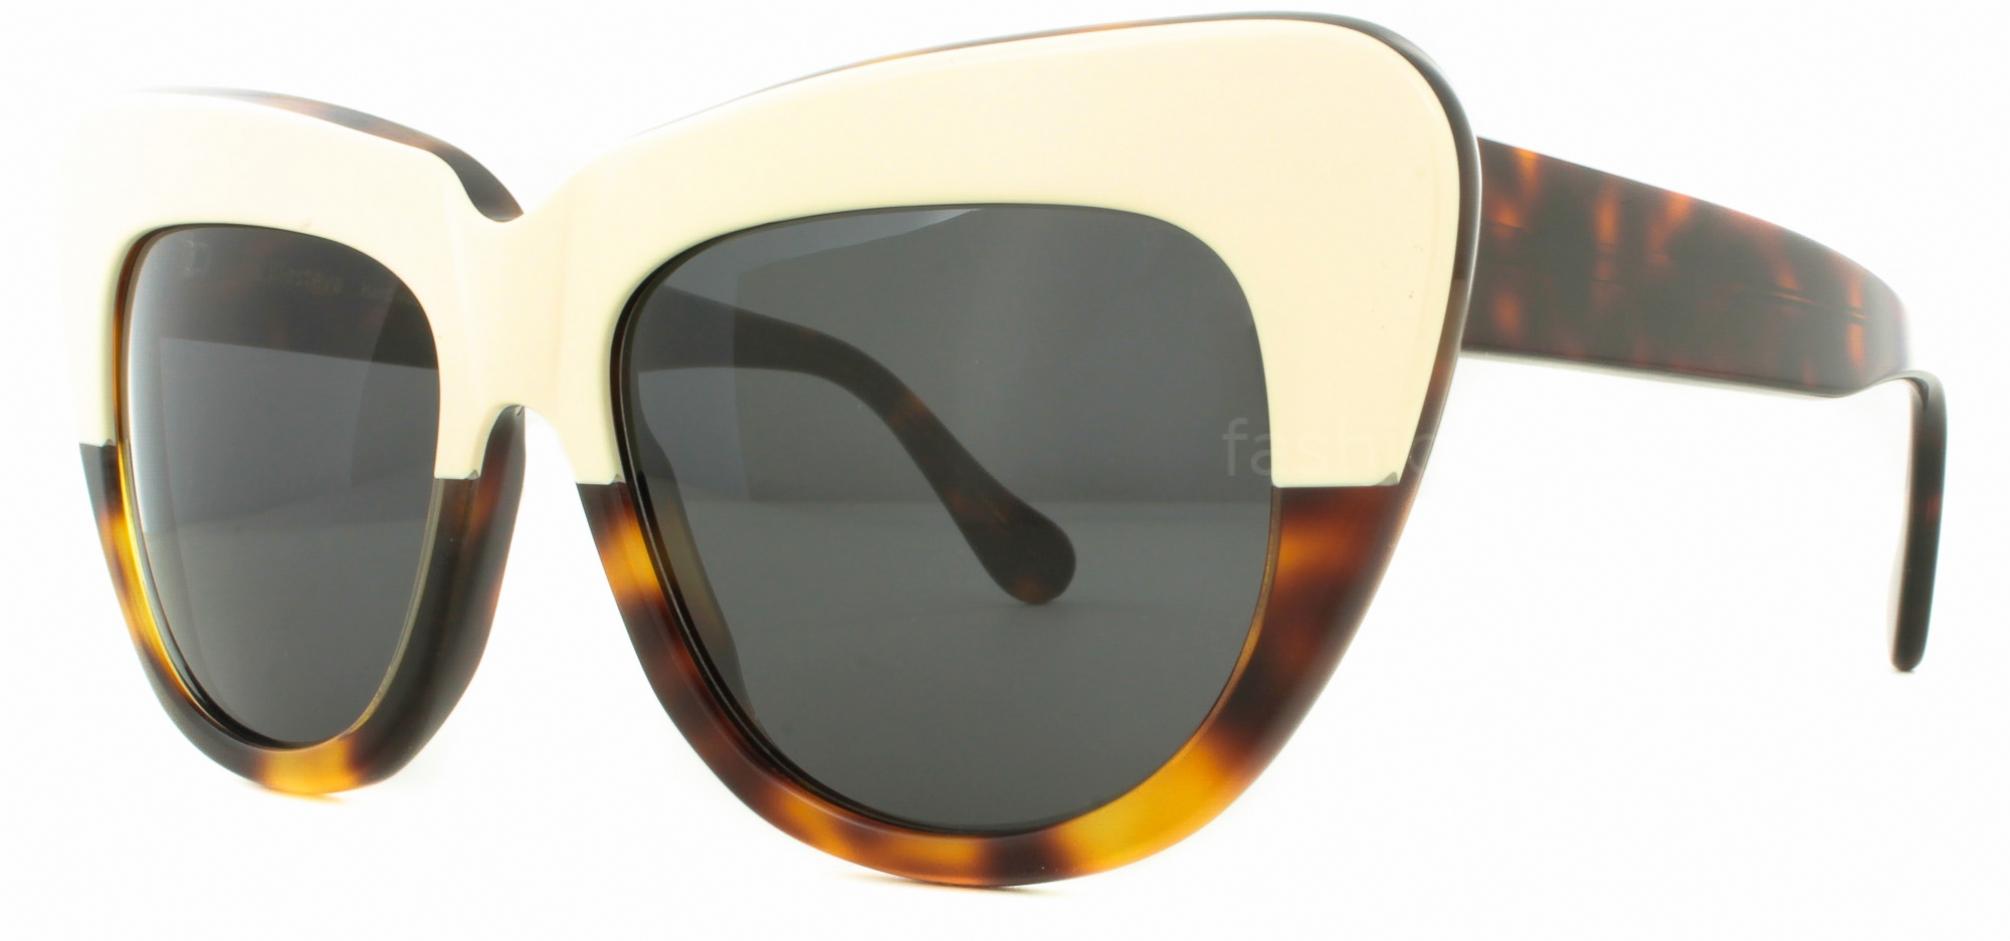 Illesteva Sunglasses  illesteva sunglasses directly from opticsfast com